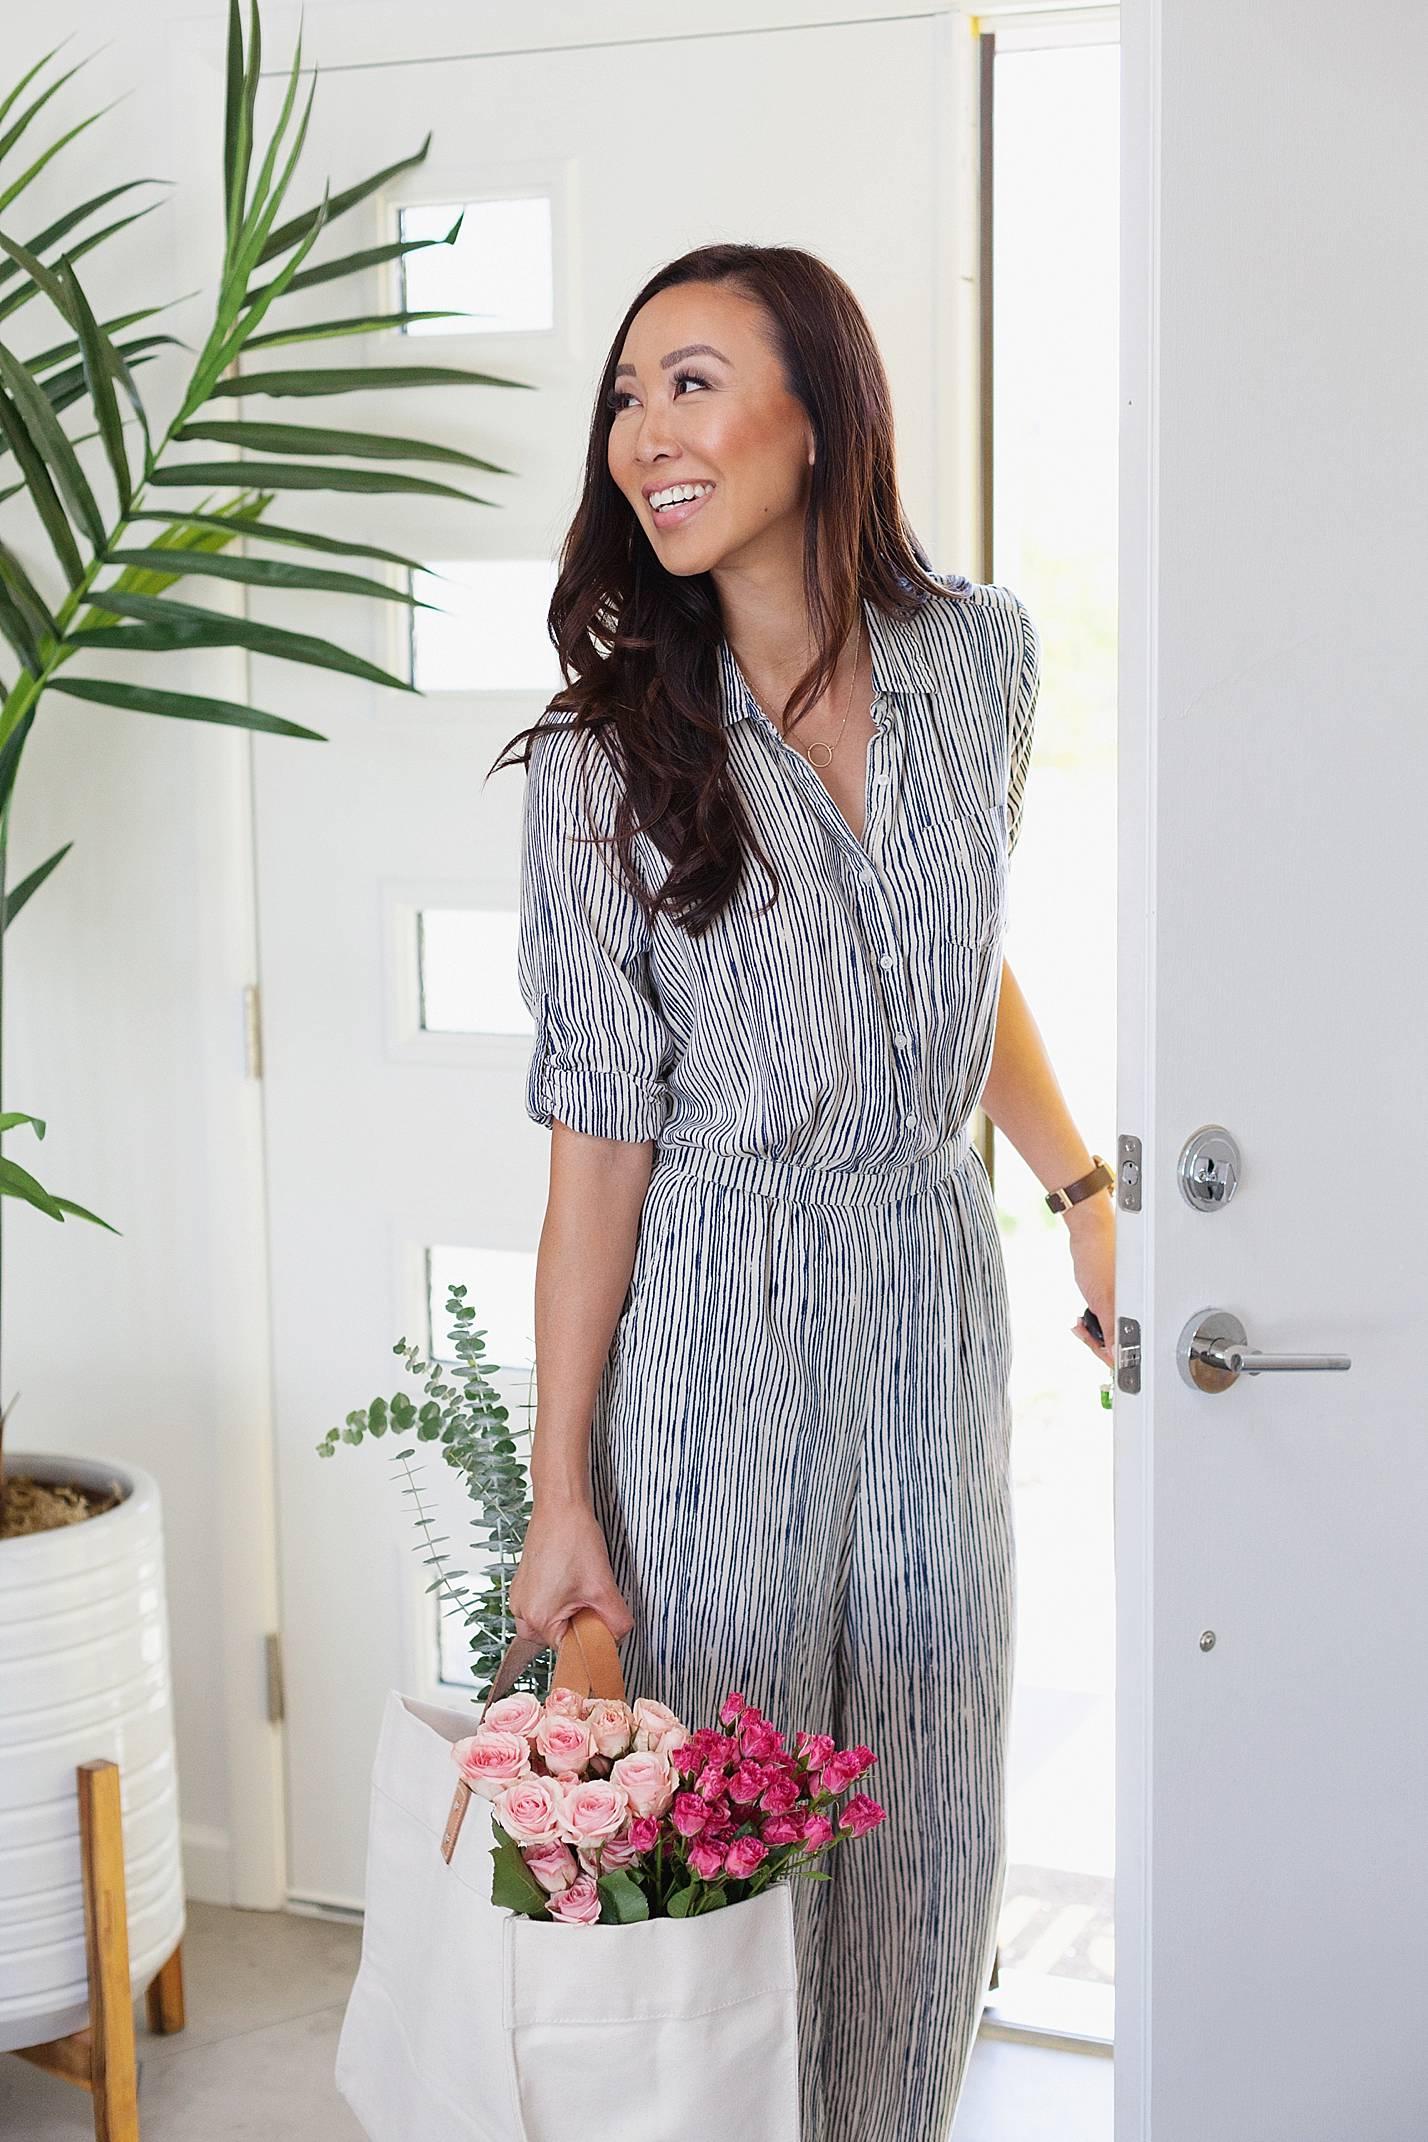 stripe jumpsuit walking in door of home with flowers in tote